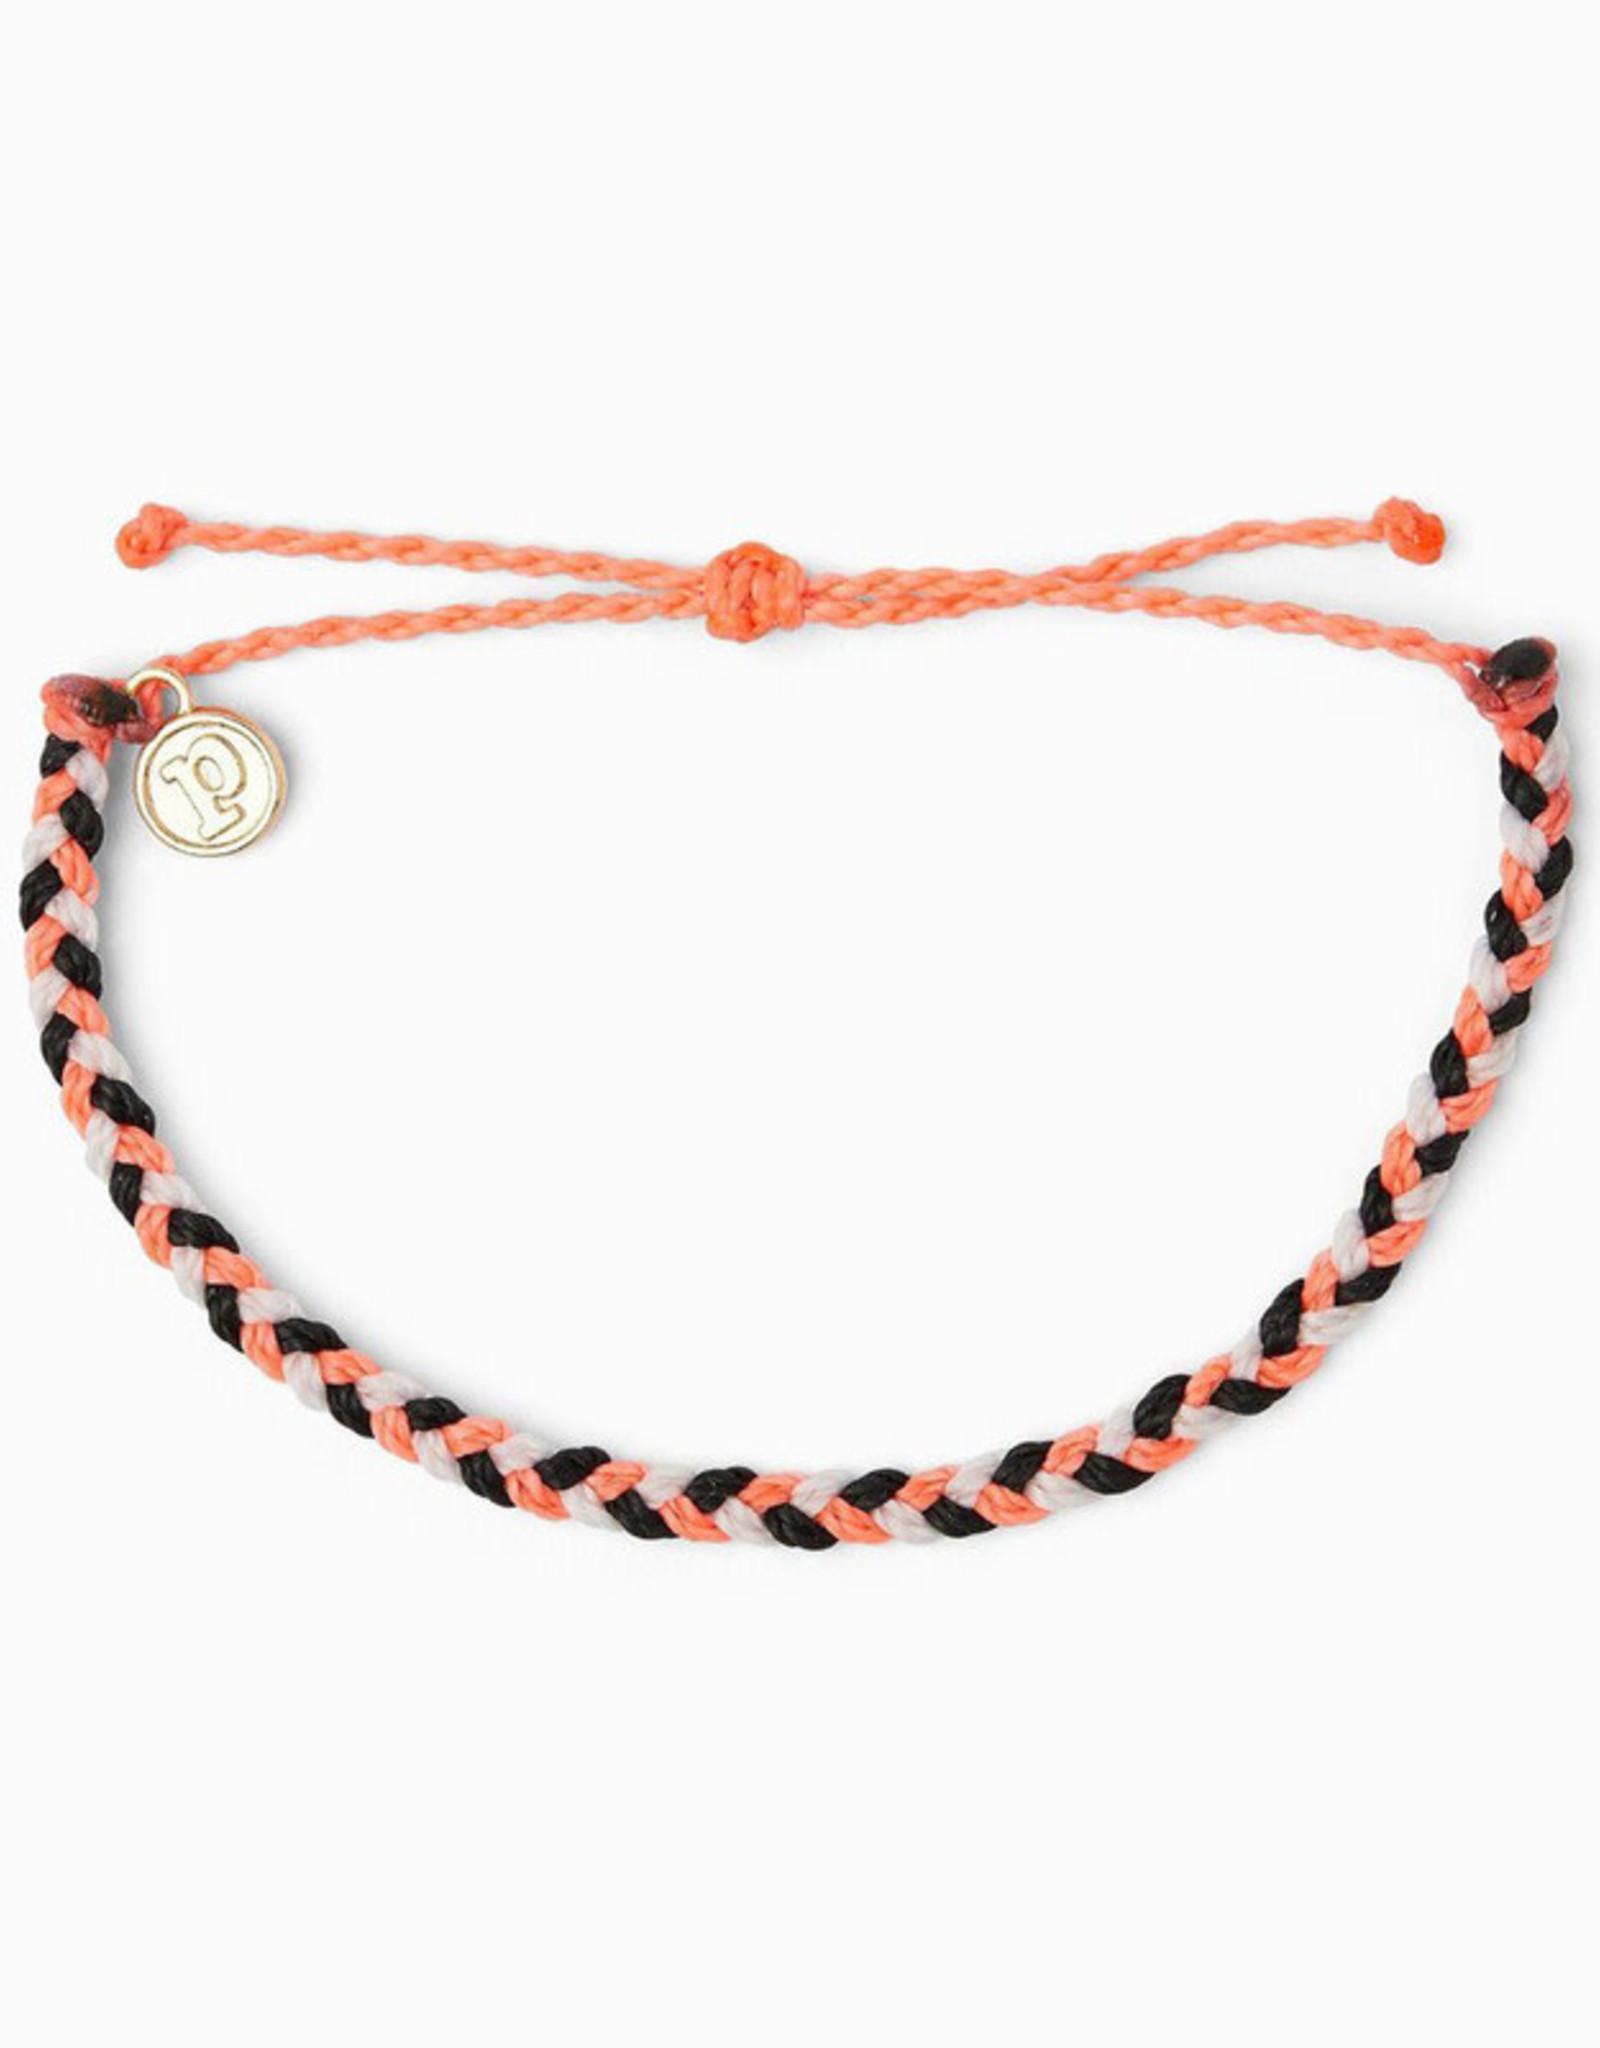 MINI BRAIDED MULTI Bracelet, BOHO